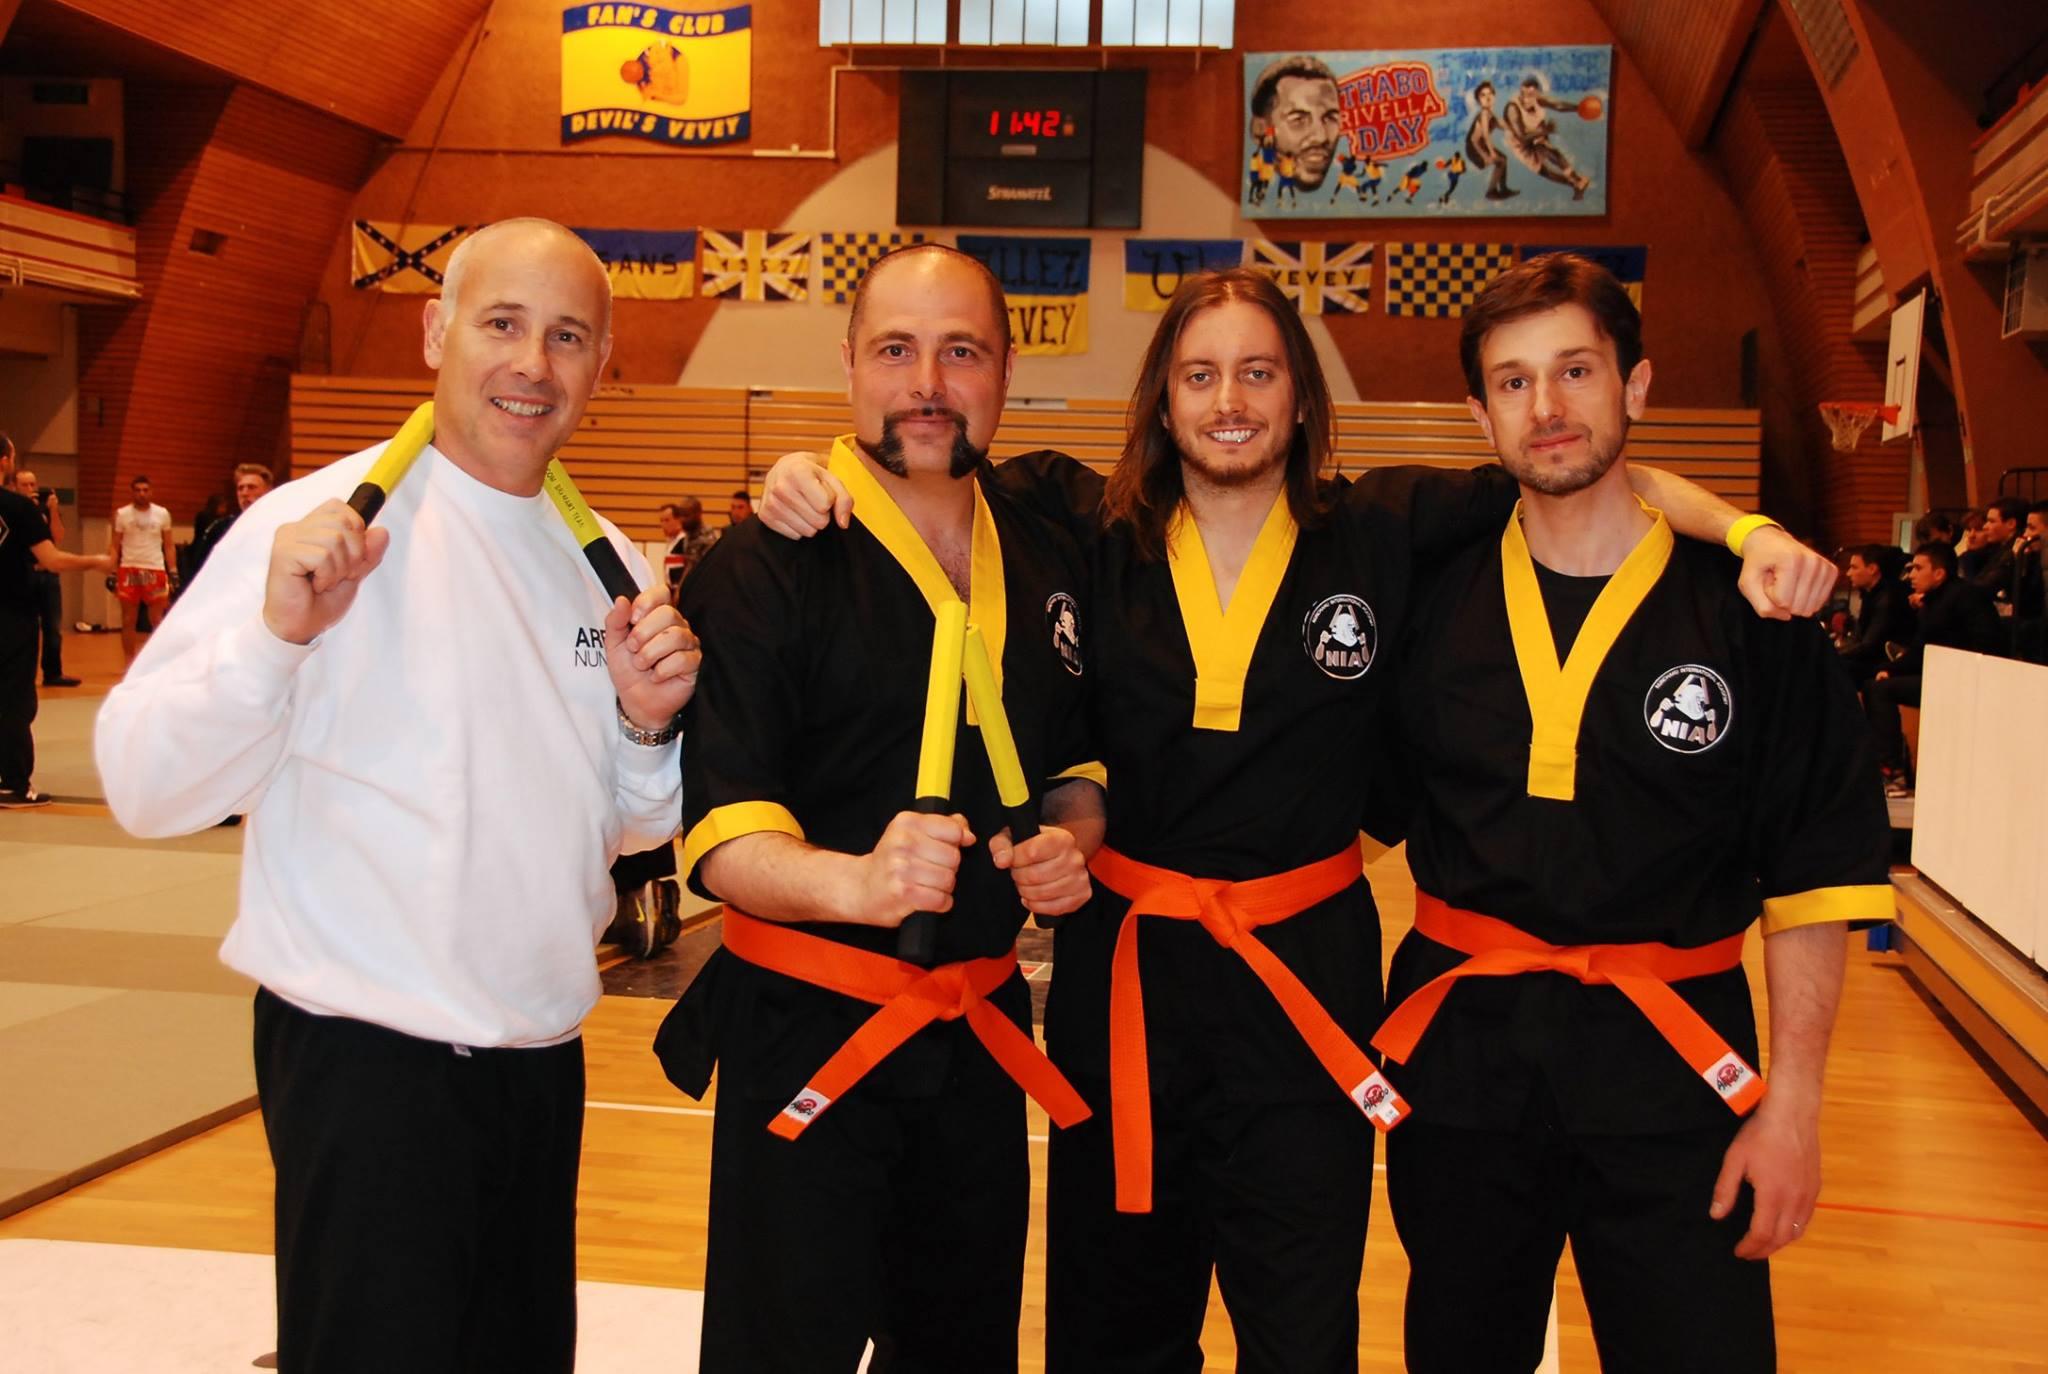 NIA Nunchaku International Academy, Marc Bremart, Amedeo, Jerry, Fabio, Vevey, Svizzera